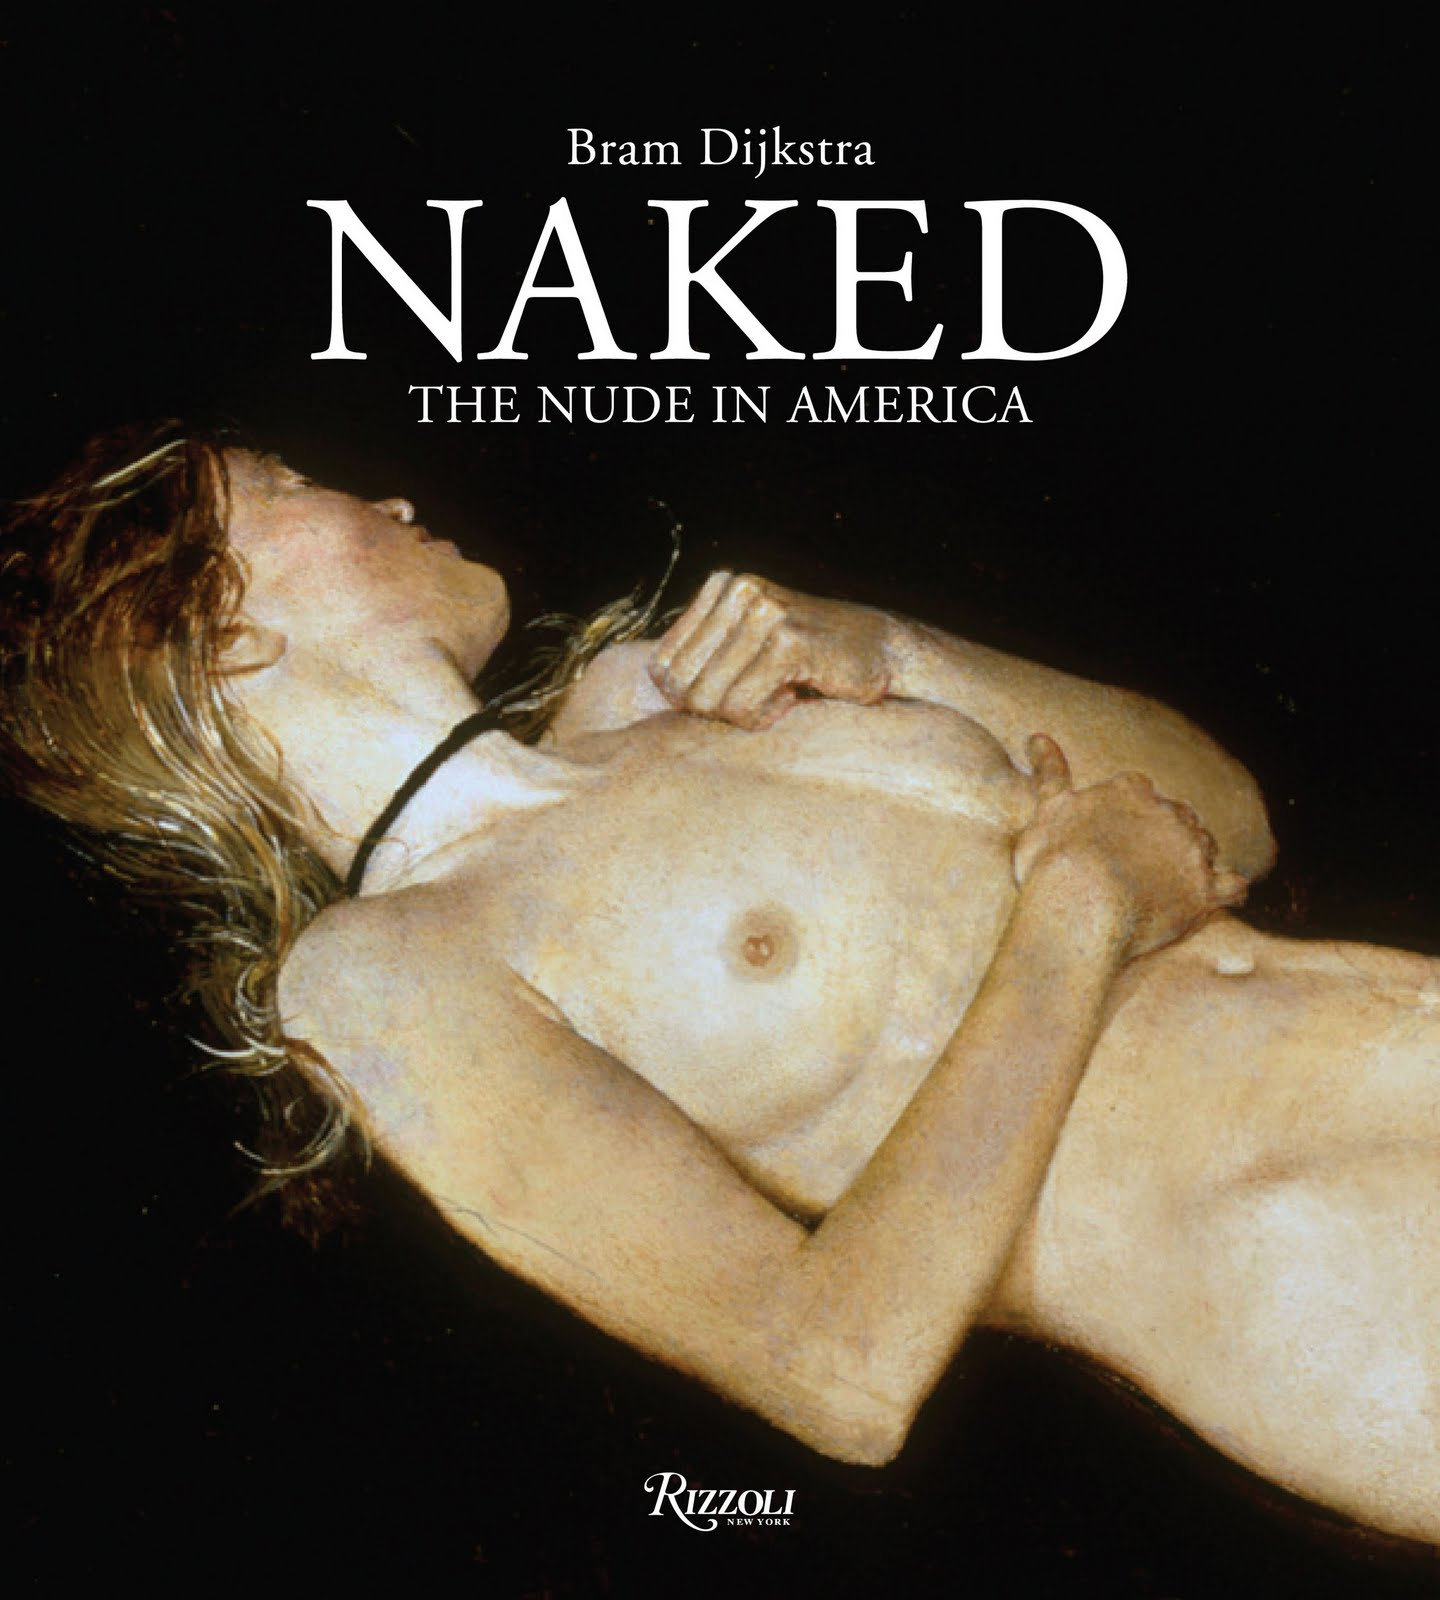 http://1.bp.blogspot.com/-ncZm_w40mgY/TdBFsmegGCI/AAAAAAAABxk/AlDX5gdw0EQ/s1600/Naked.jpg